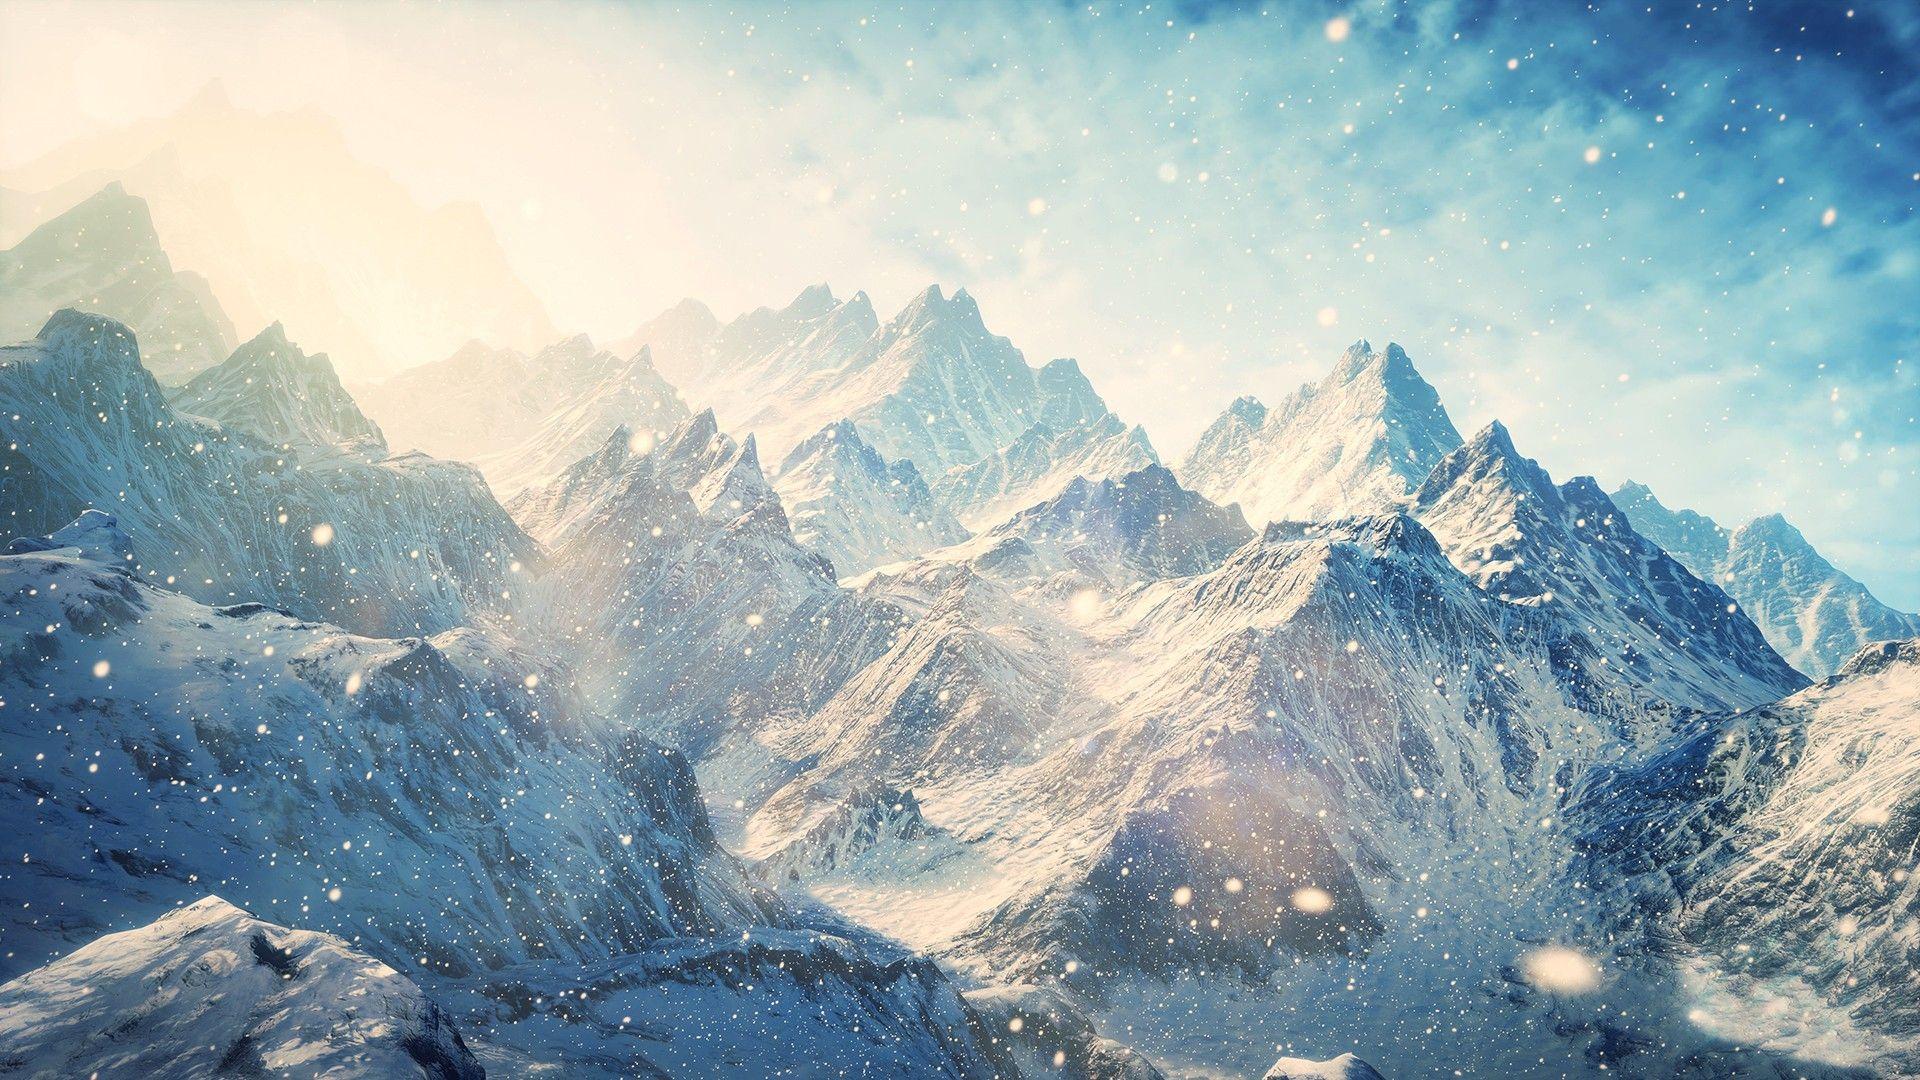 Beautiful Winter Landscape White Mountains Winter Wallpapers Seasons Wallpapers Download Beautiful Iphone 5s Wallpaper Winter Wallpaper Mountain Wallpaper